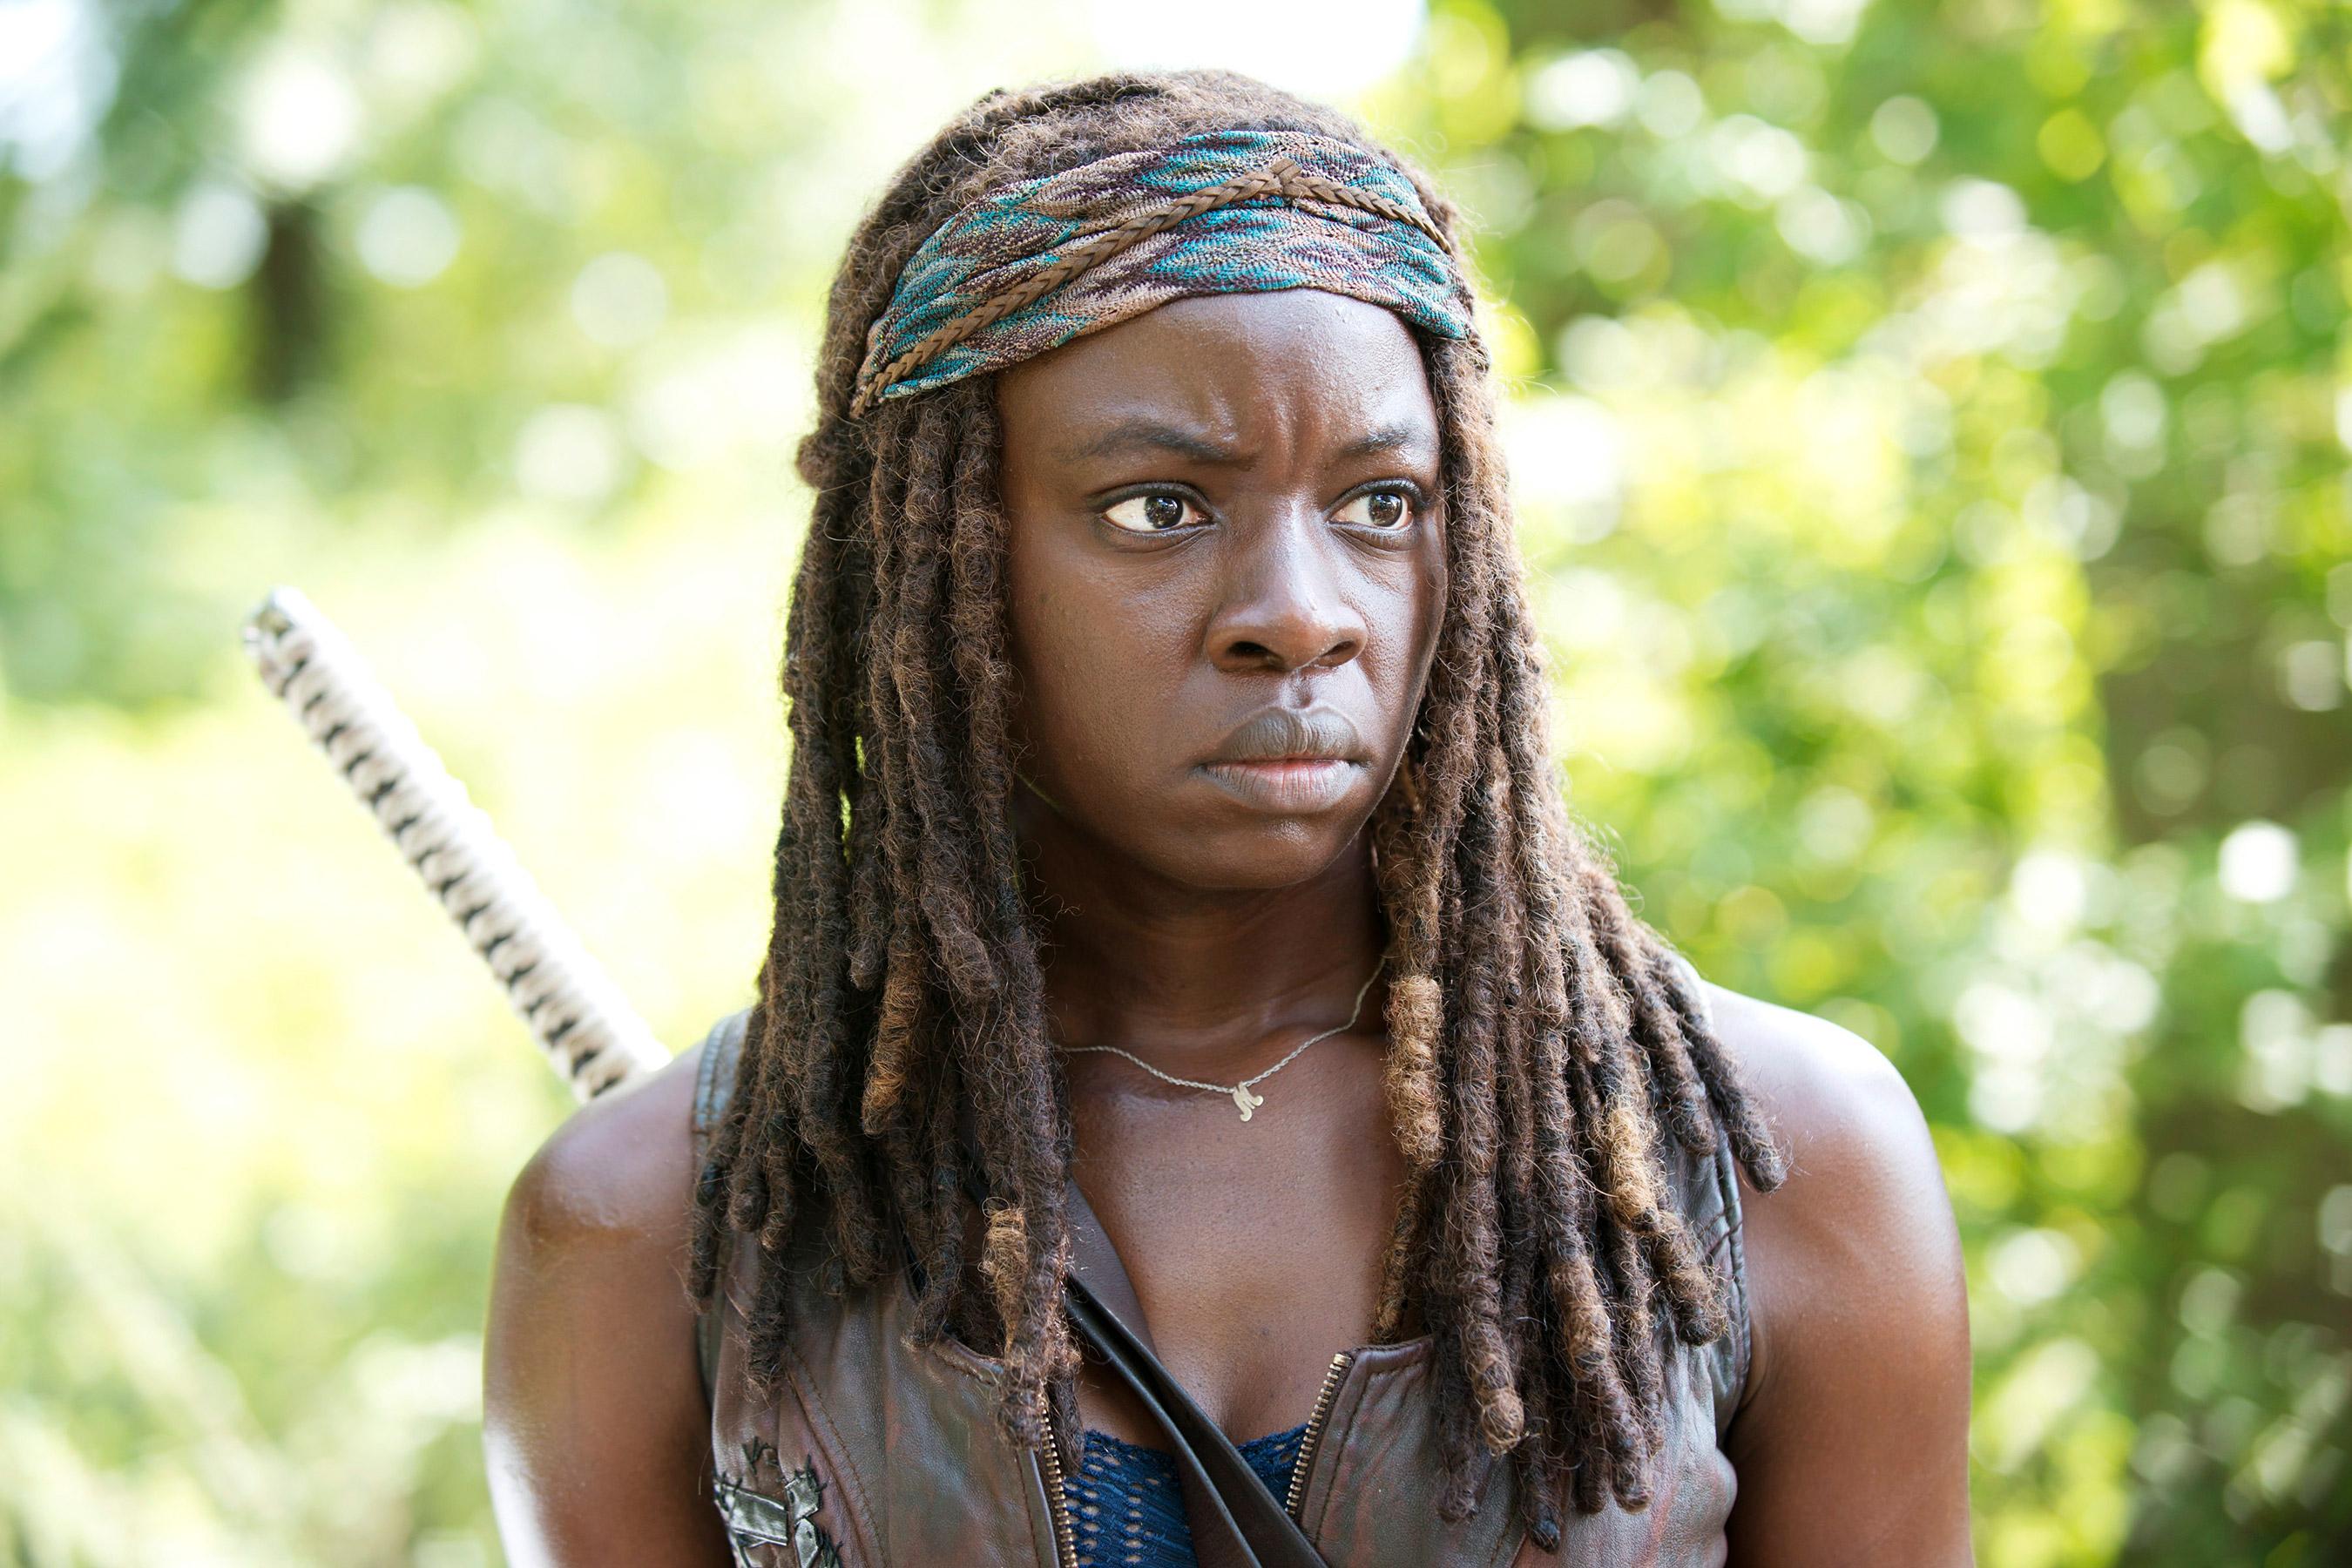 Danai Gurira as Michonne in The Walking Dead